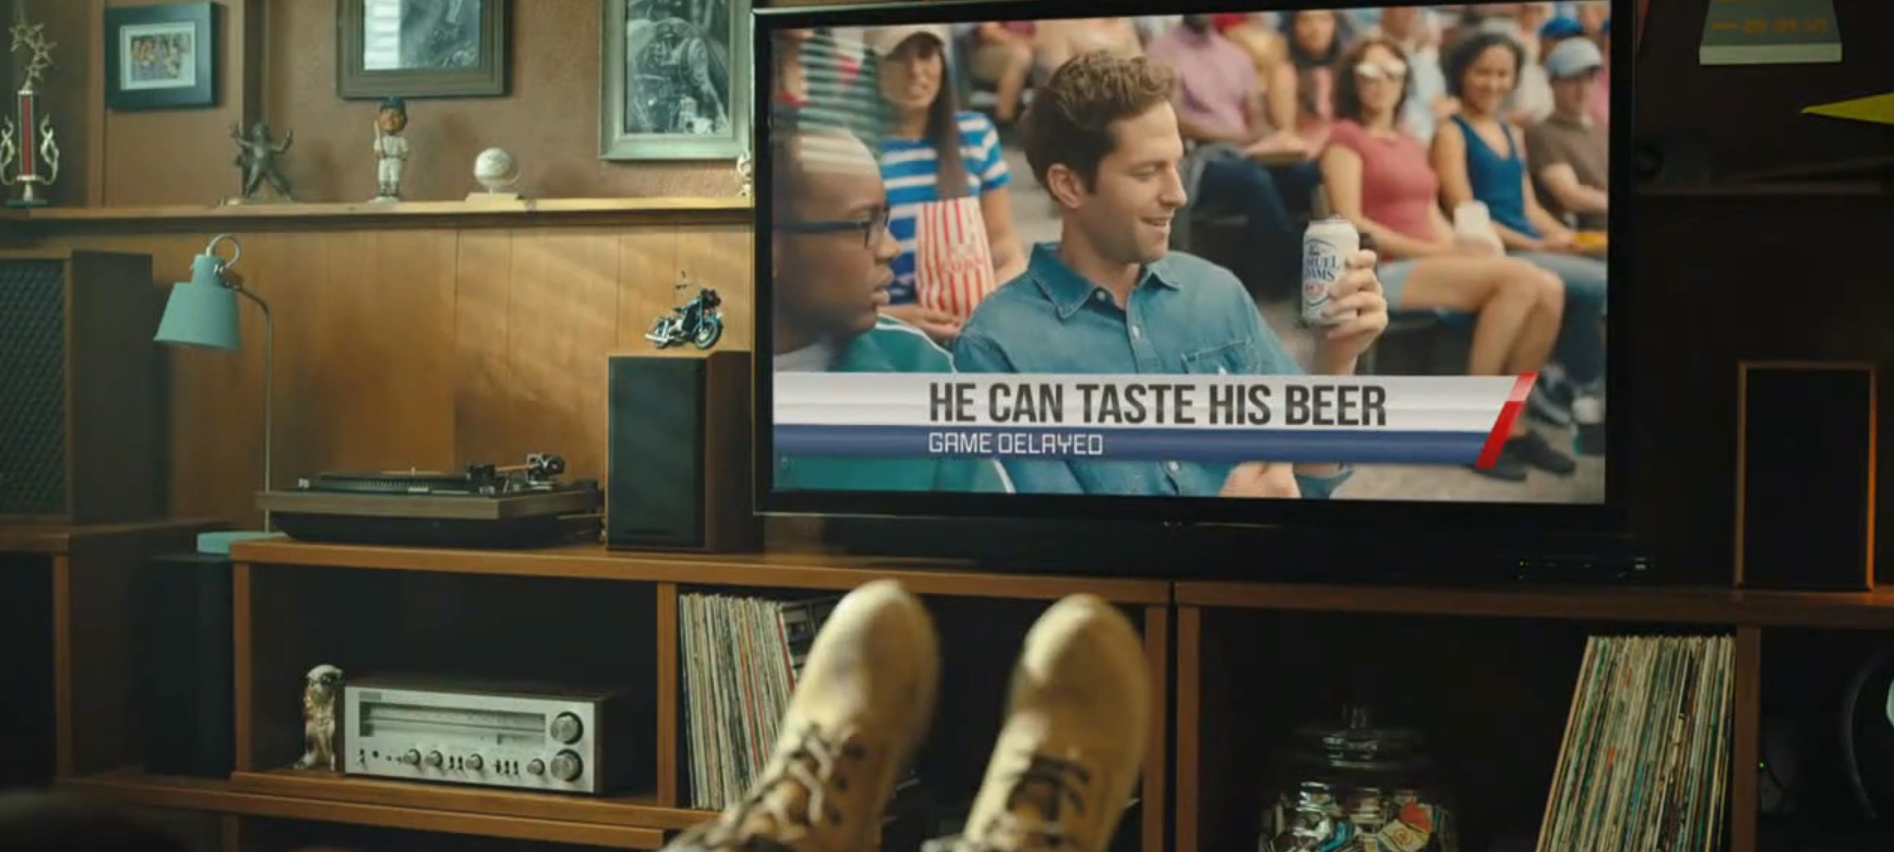 I can taste my beer